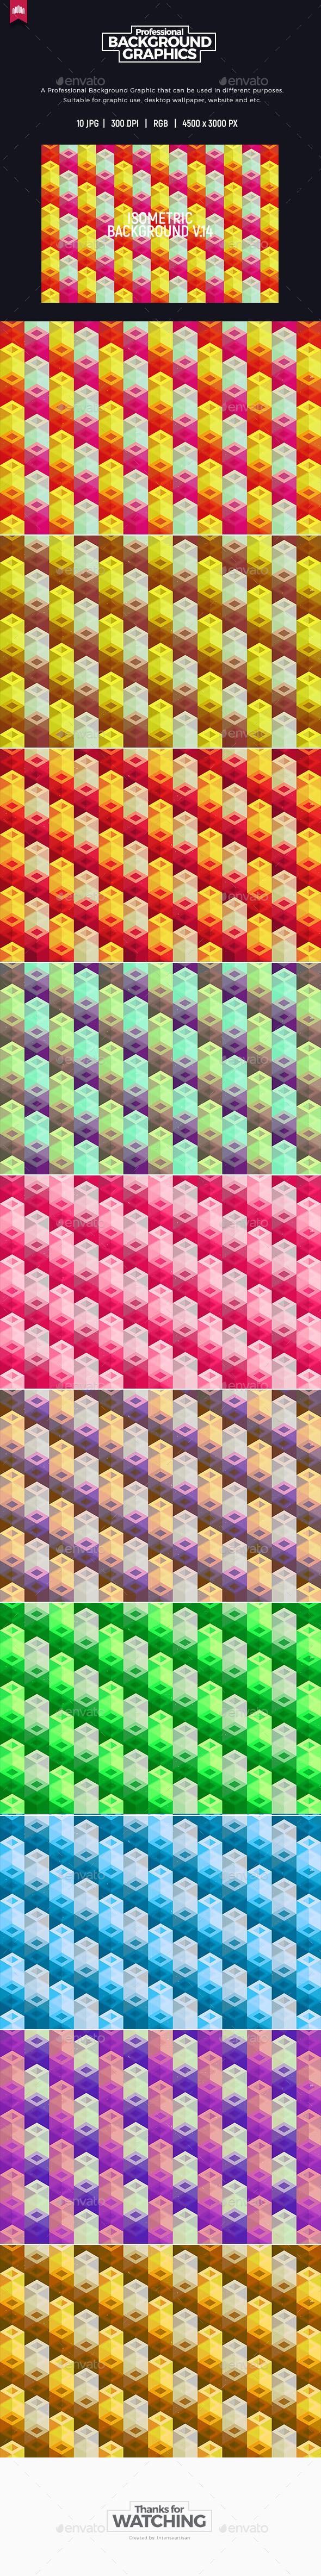 Isometric Background V.14 - Patterns Backgrounds